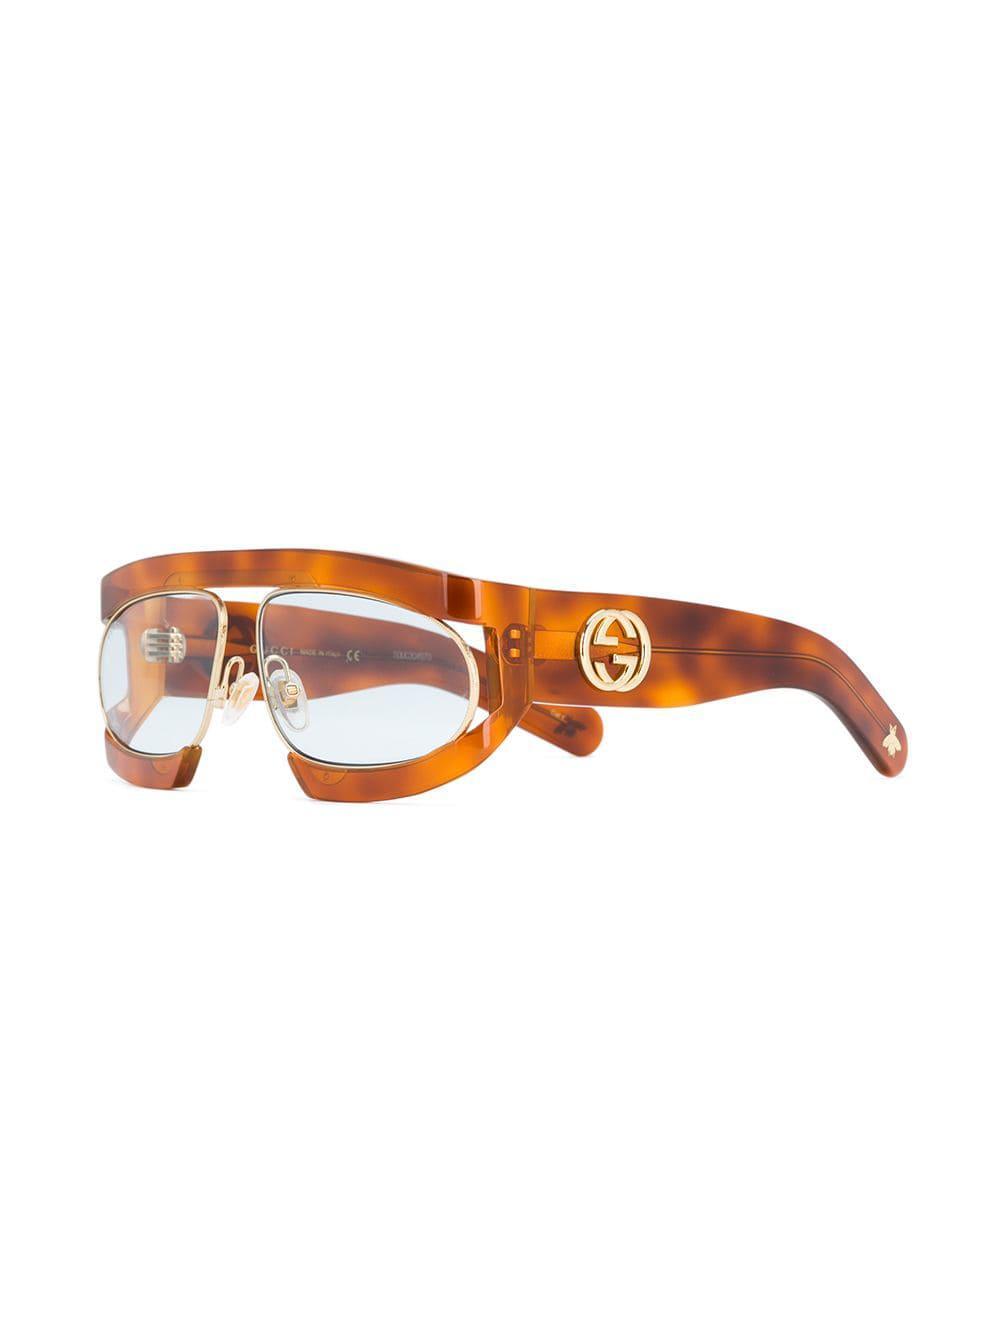 acd866a698 Gucci - Brown Tortoiseshell-effect Glasses - Lyst. View fullscreen